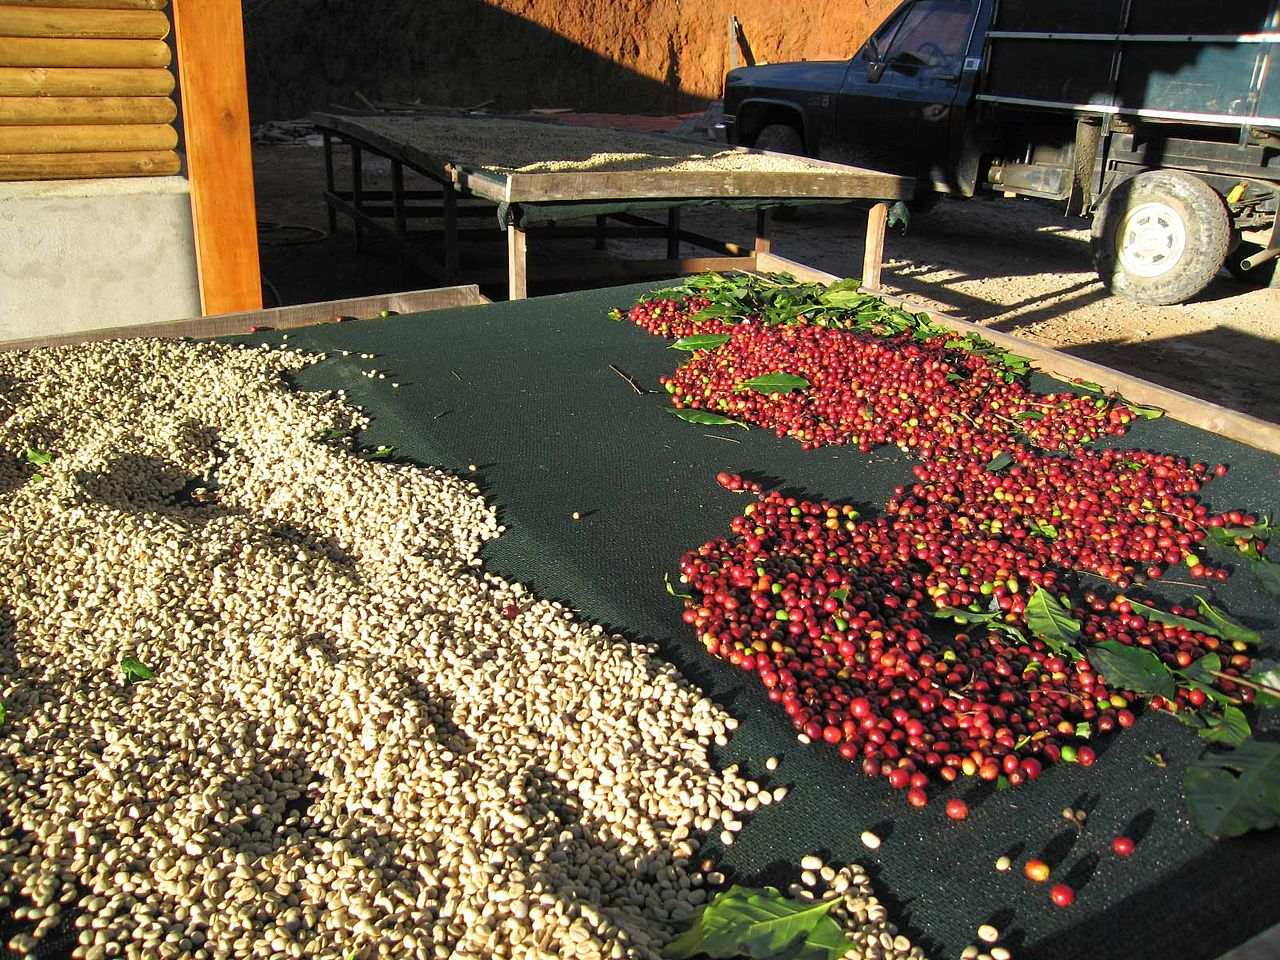 1280px-Coffee-cherries-green-coffee-tarrazu-costa-rica